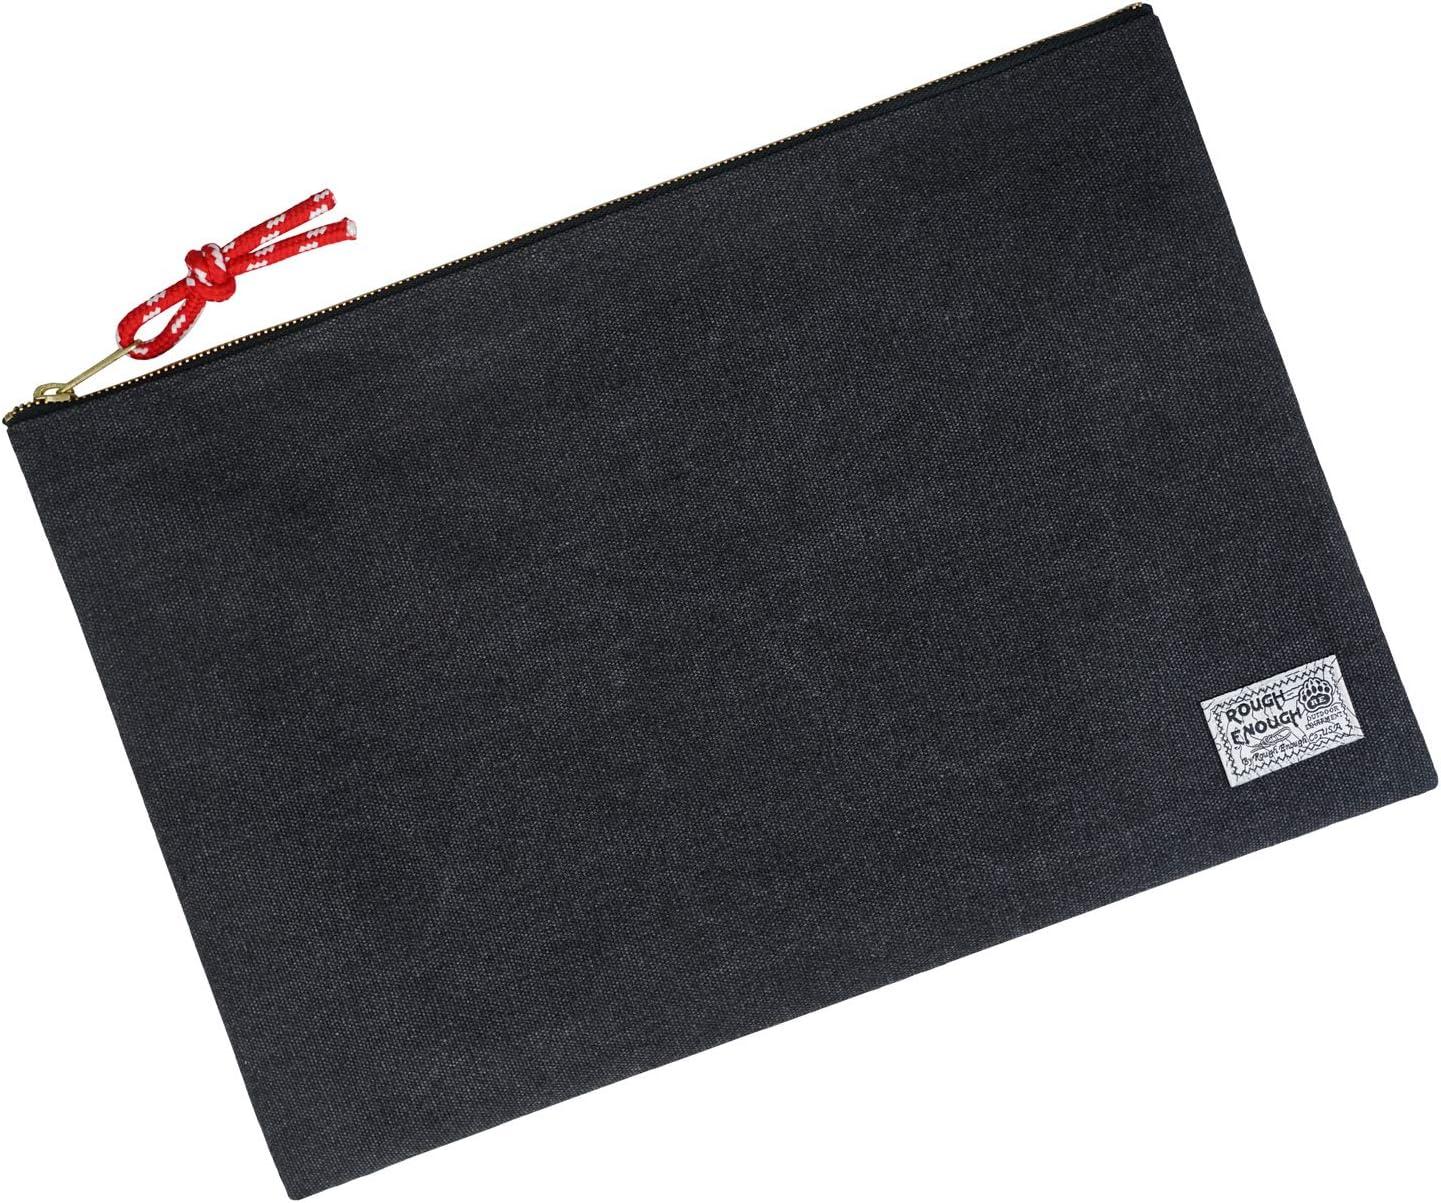 Rough Enough Large File Folders Holder Document Safe Organizer Canvas Zipper Pouch for Filing Important Legal of Travel Portfolio A4 Manila Letter Size Art Paperwork Office School Pocket Big Bag Pouch